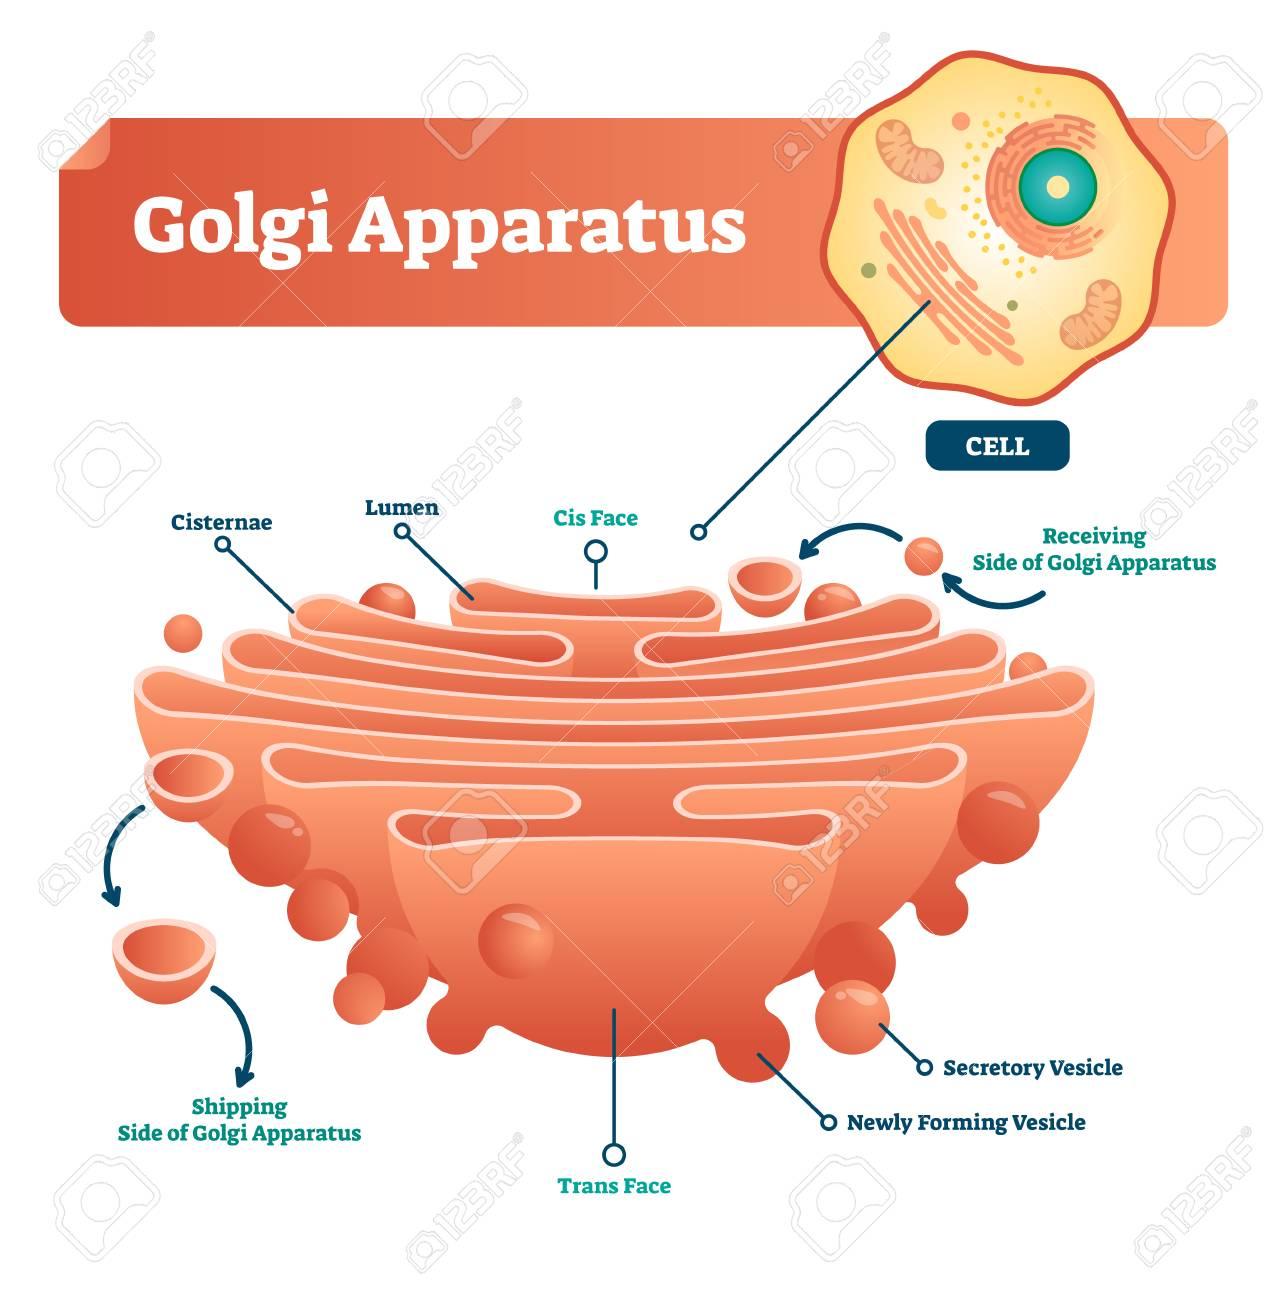 hight resolution of golgi apparatus vector illustration labeled microscopic scheme with cisternae lumen cis or trans